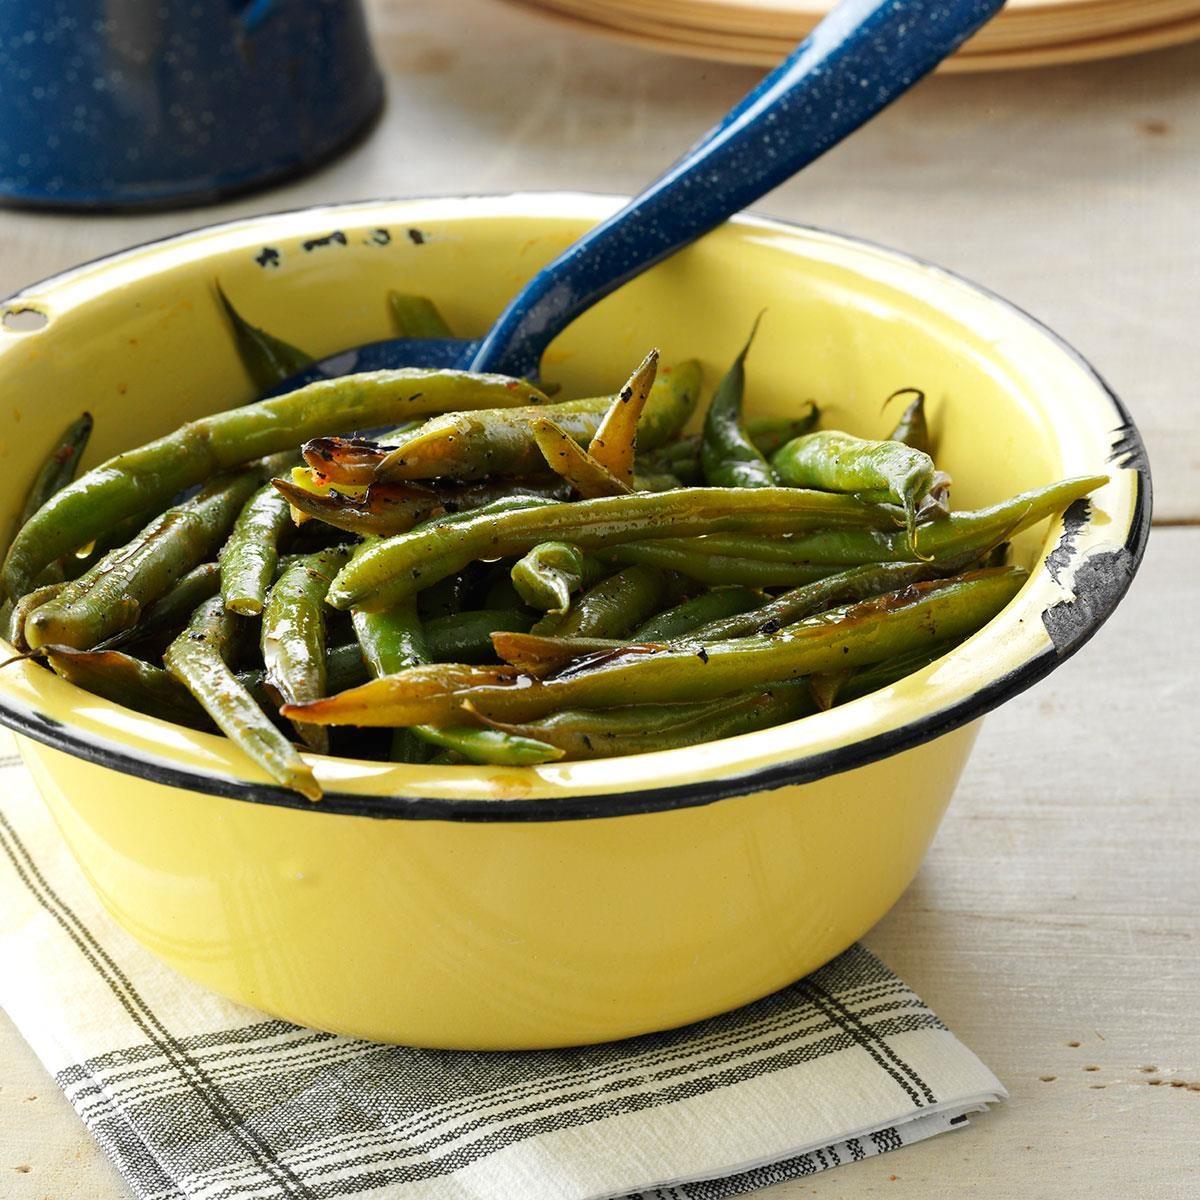 Grilled Cajun green beans